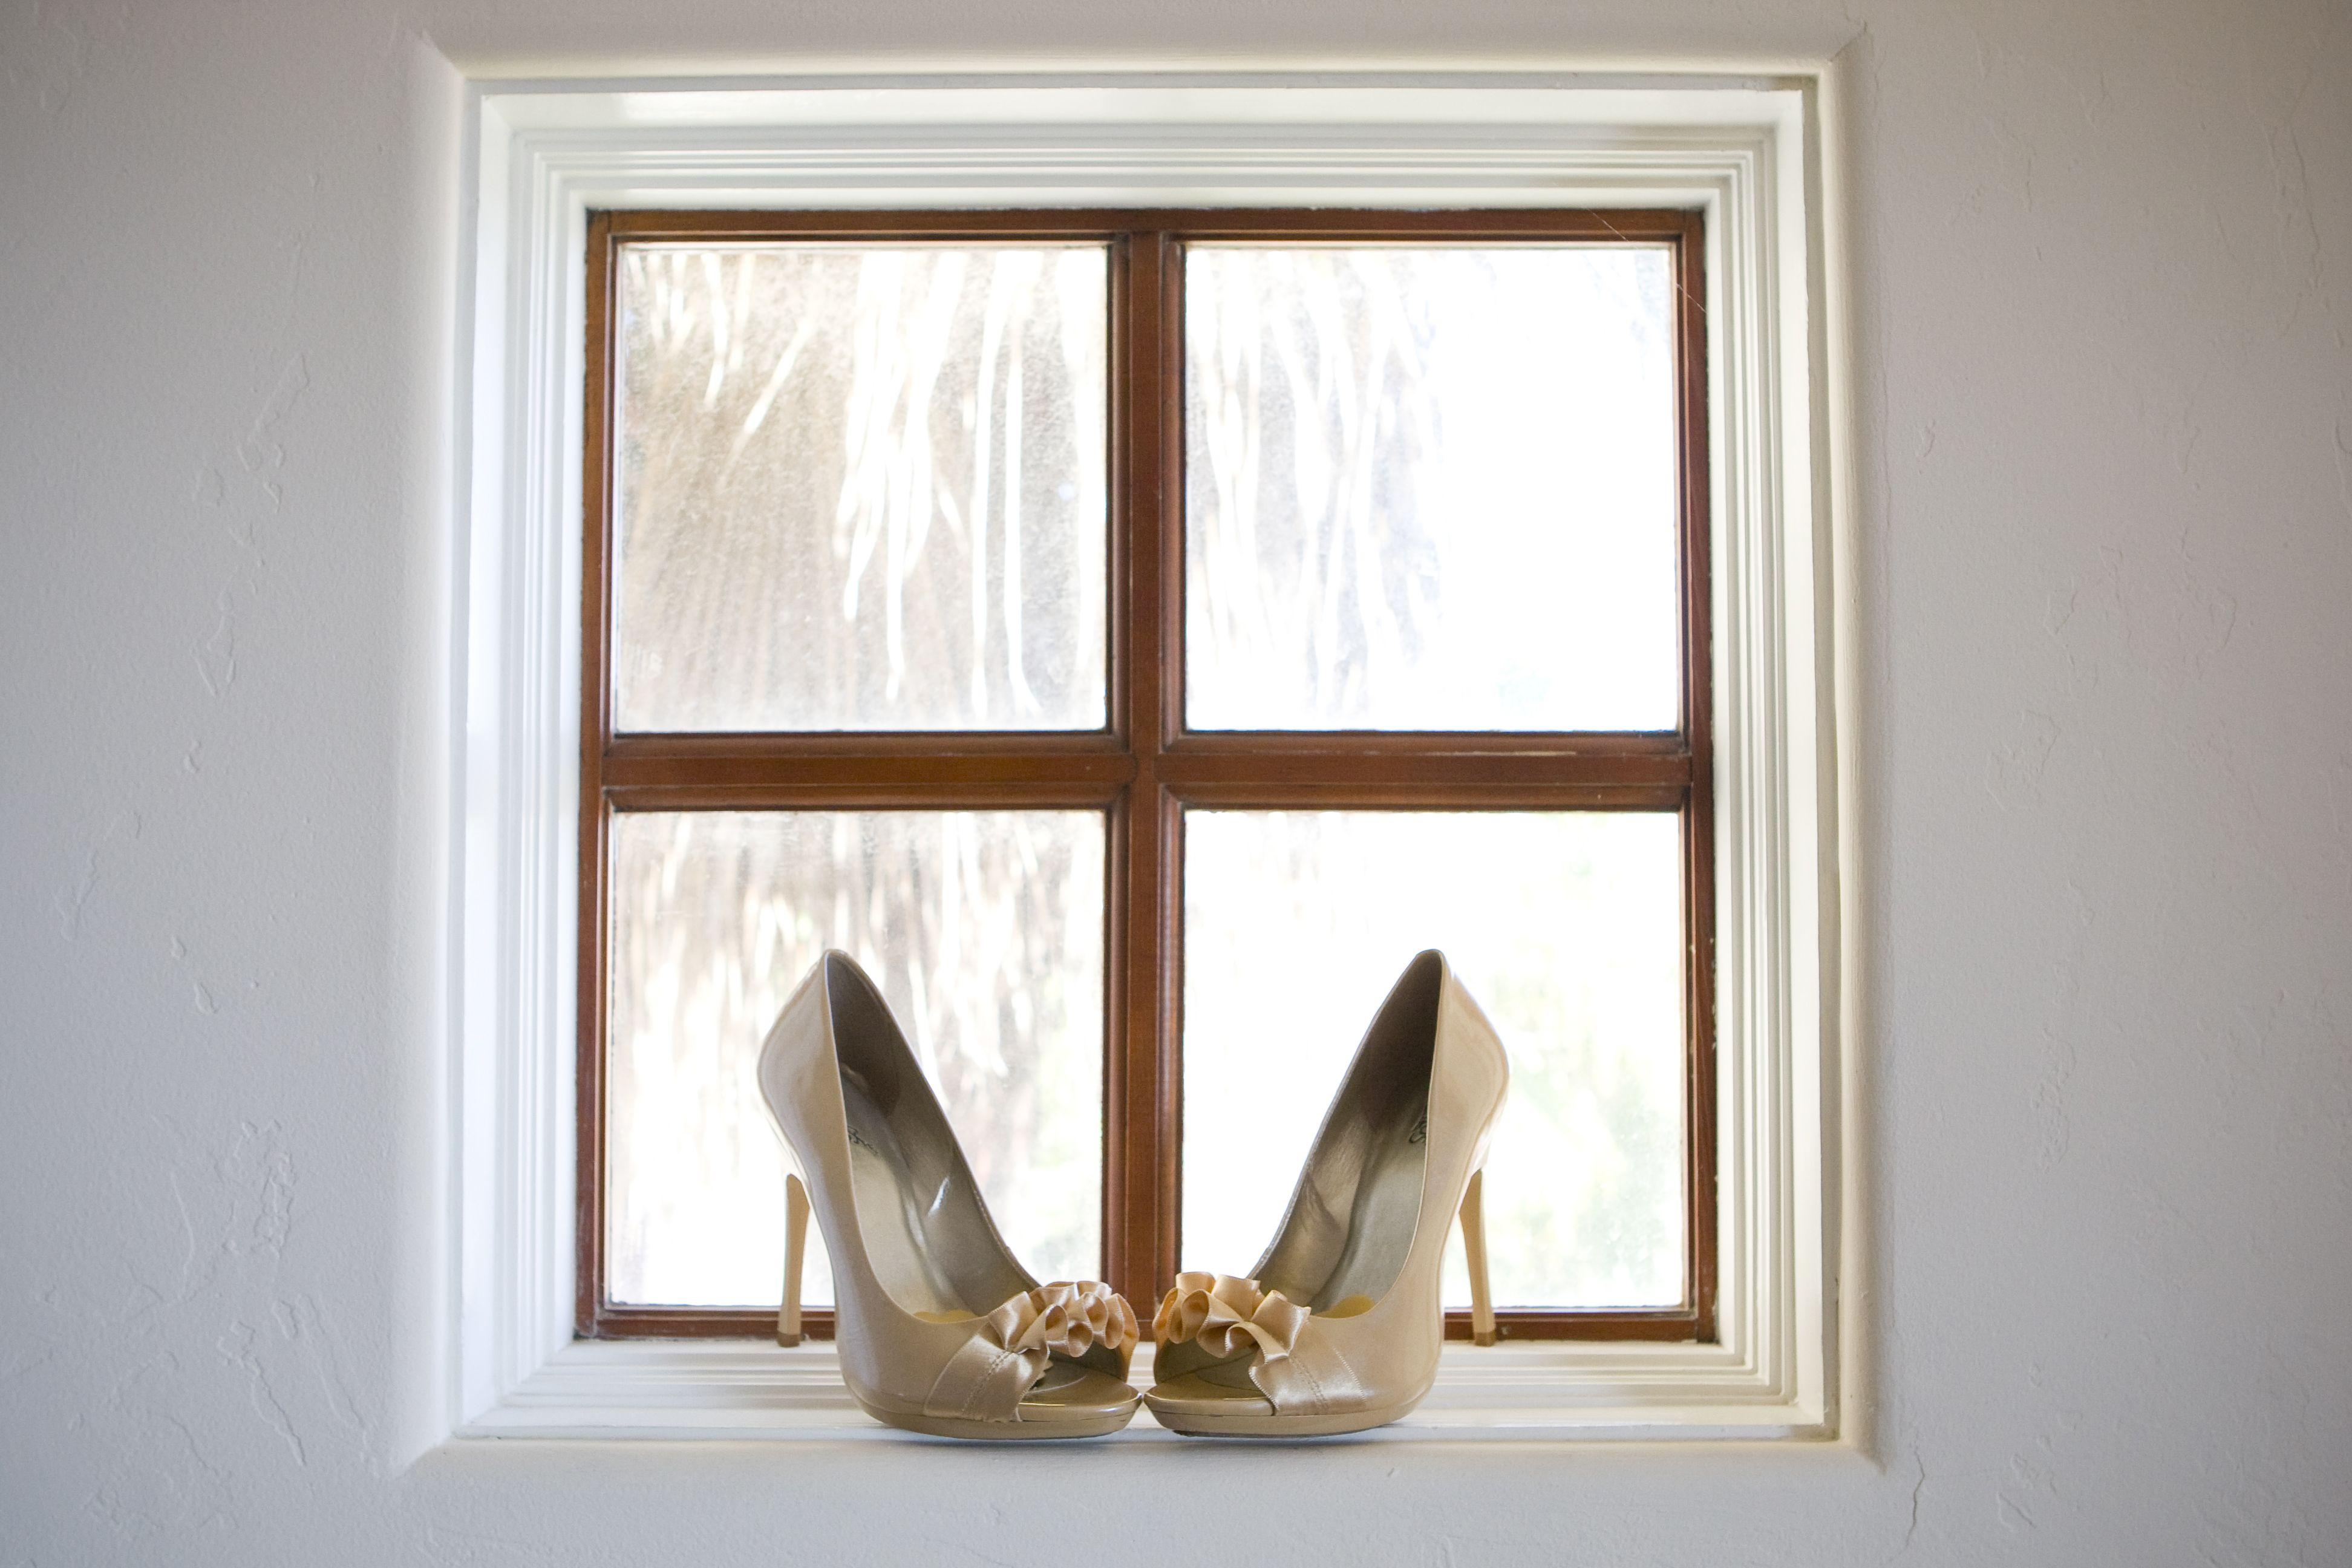 Ruffle wedding shoes at wedding on window sill